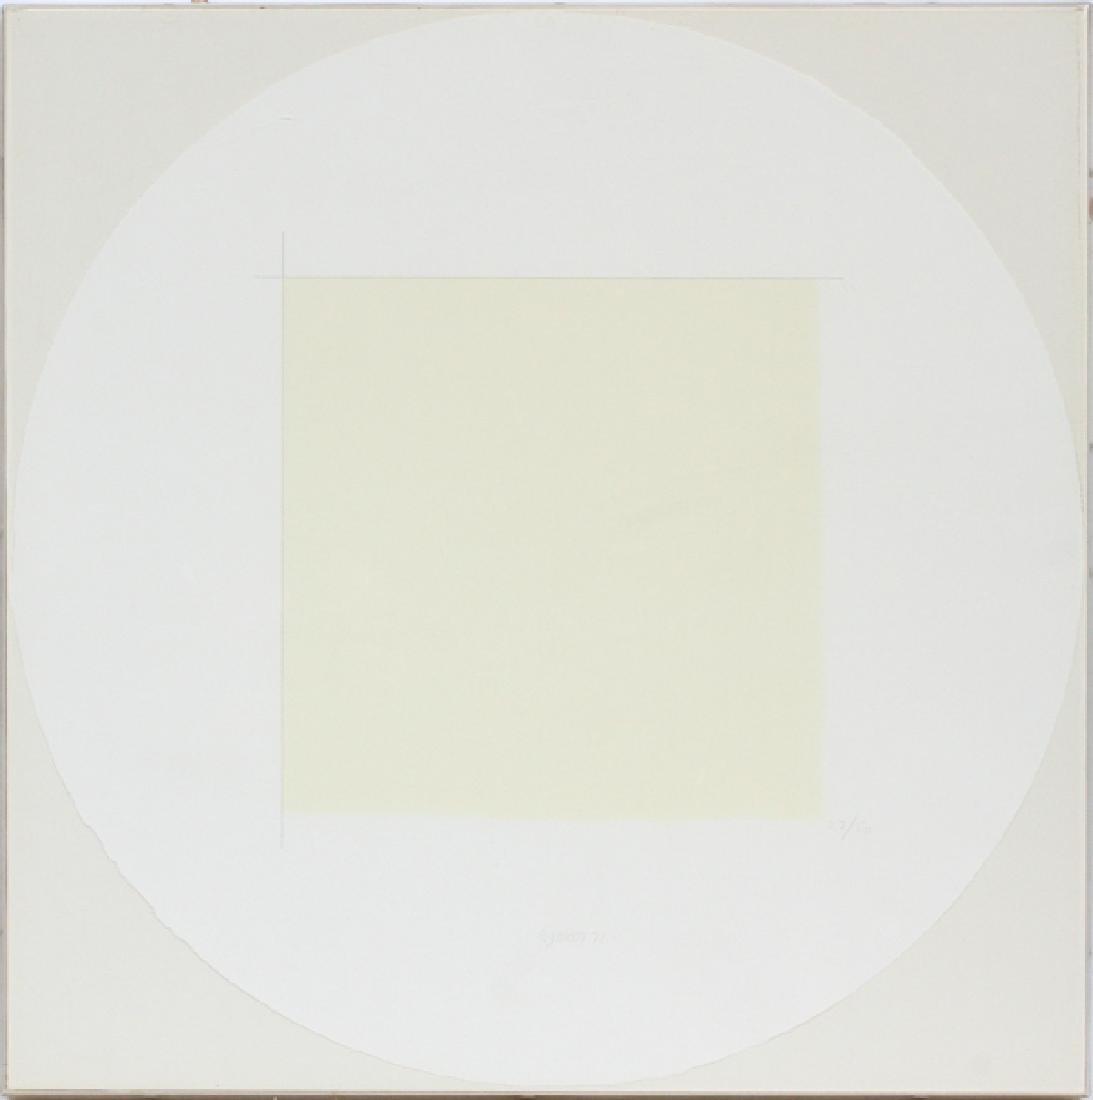 "ROBERT RYMAN CIRCLE LITHOGRAPH 1971 ""TWO STONES"""